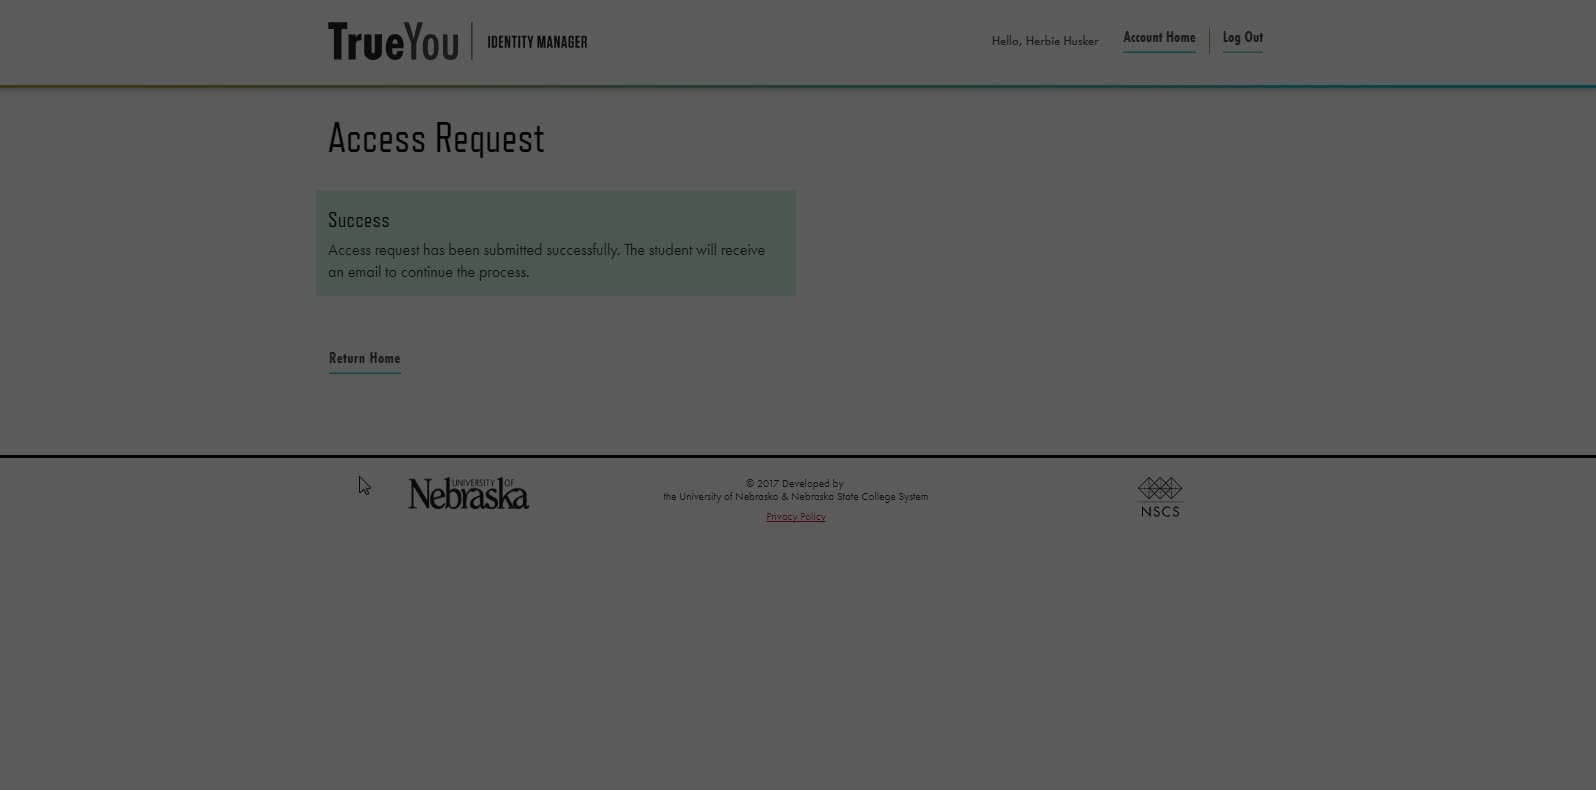 Step 2.2: Request Access